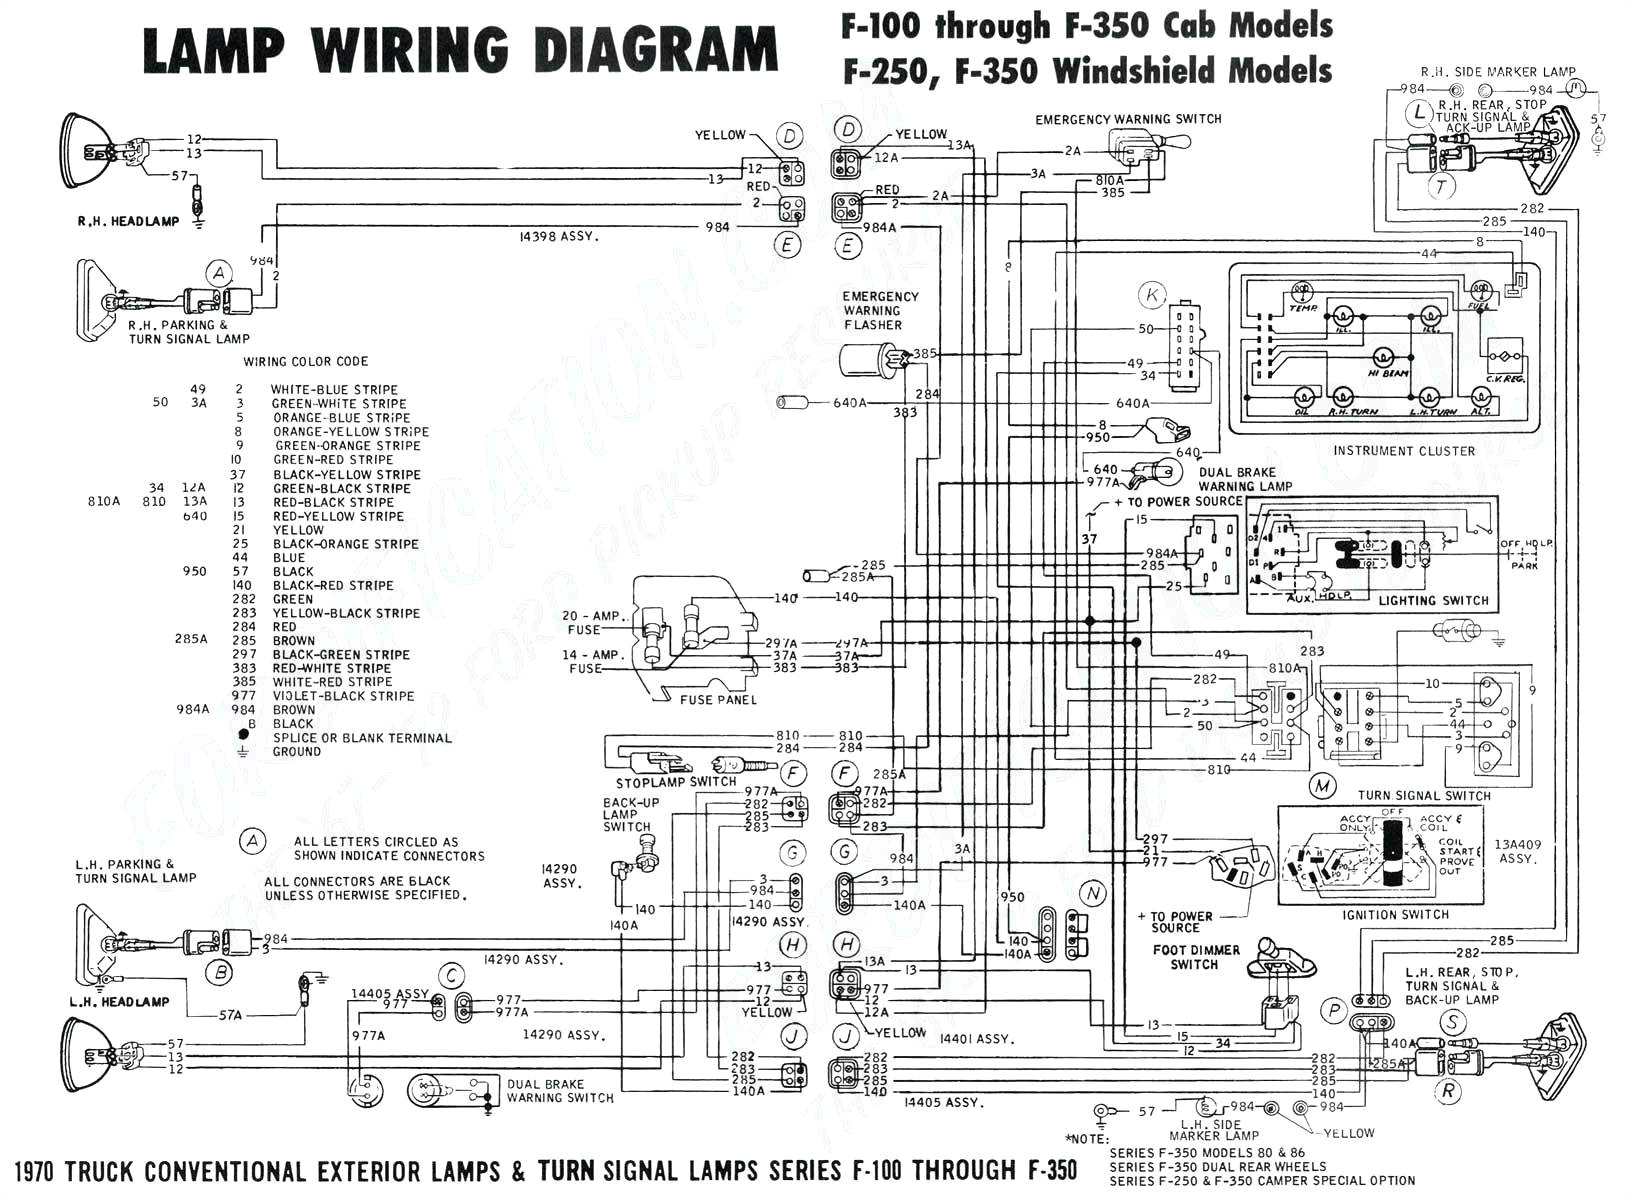 1969 ford Bronco Wiring Diagram 1969 F250 Wiring Diagram Wiring Diagram Note